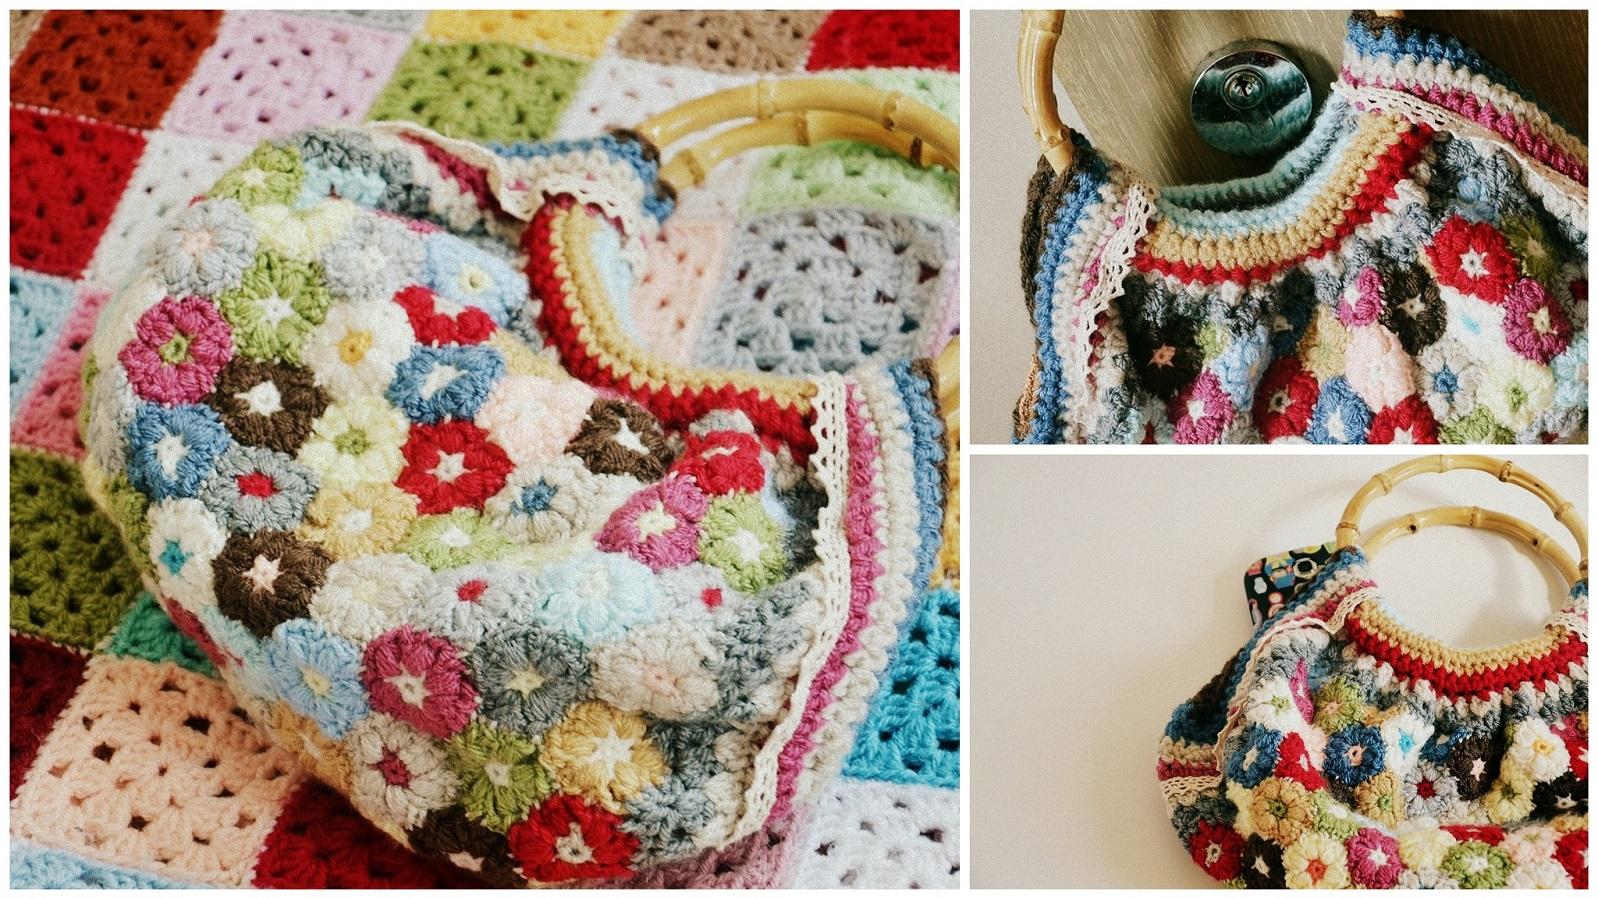 Puff Flower Crochet Pattern You Need To Learn | Crocheting ...